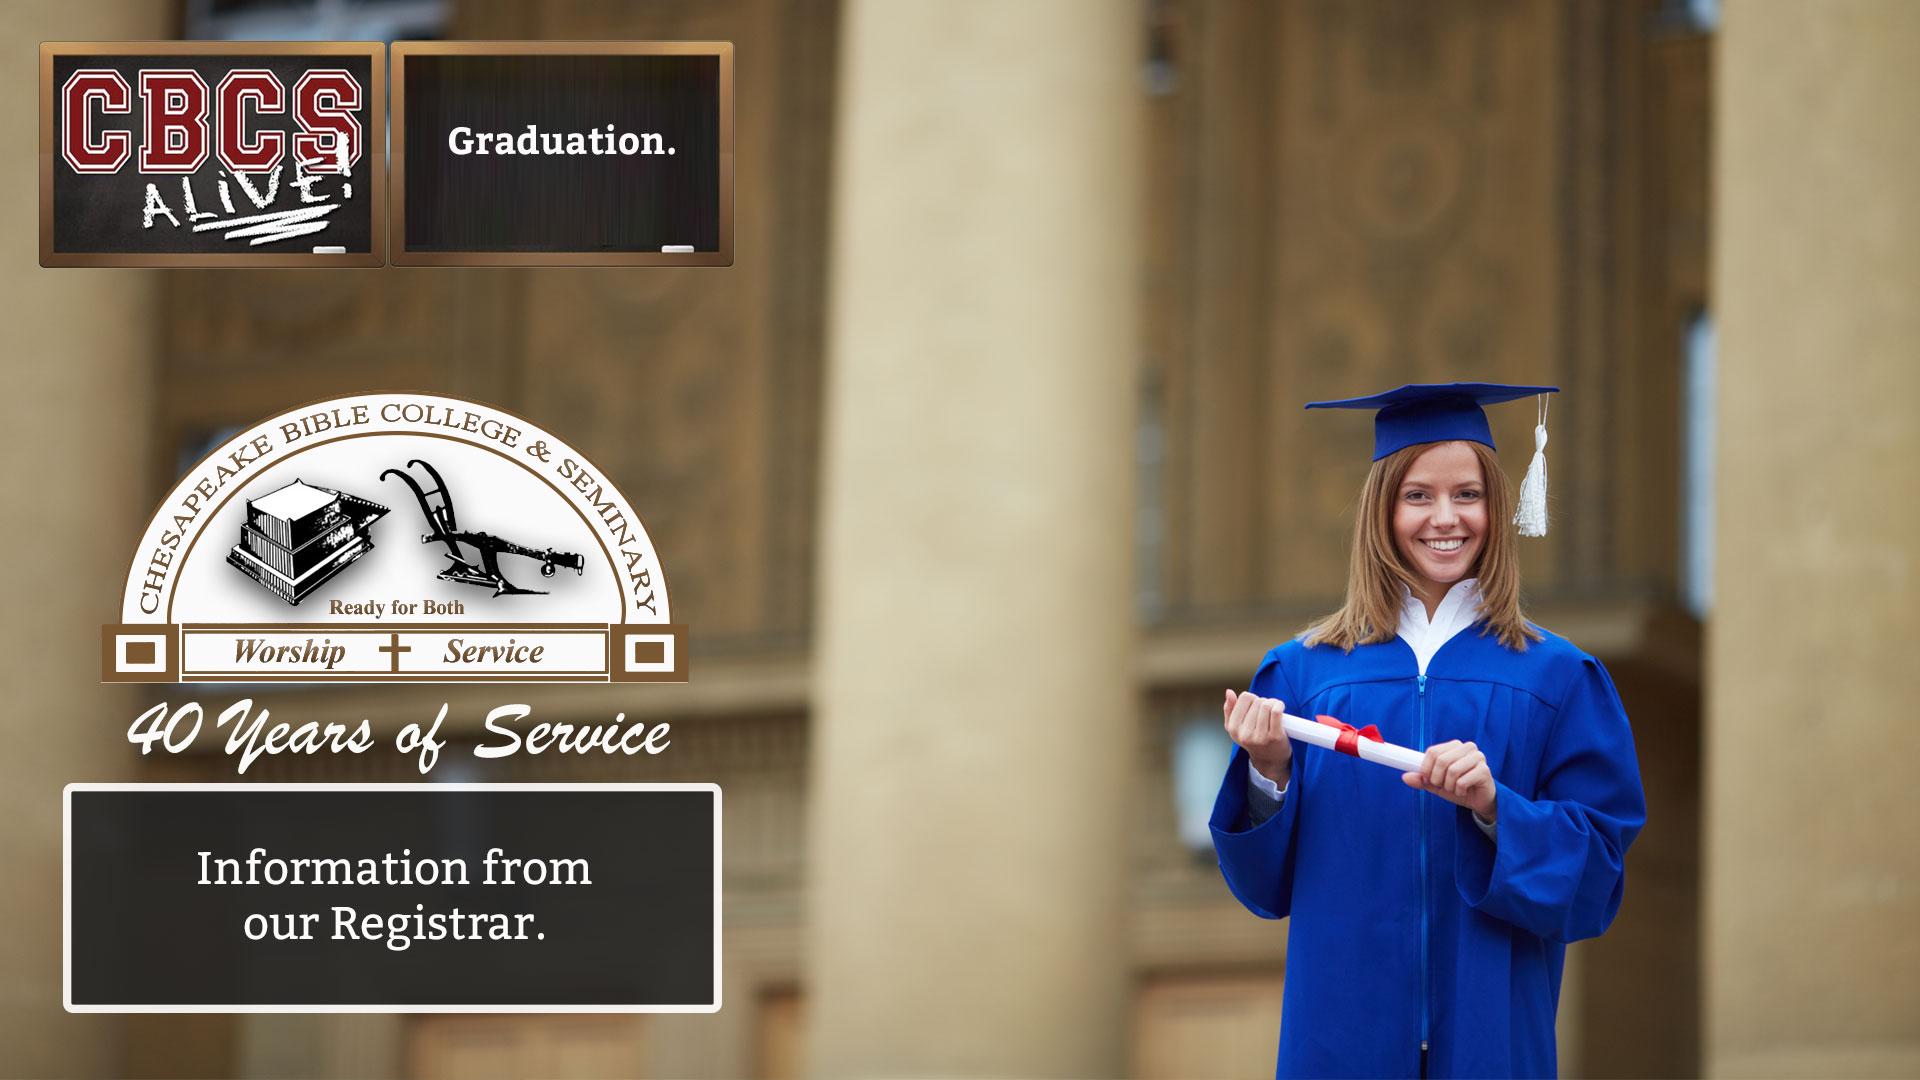 Chesapeake Bible College & Seminary Graduation